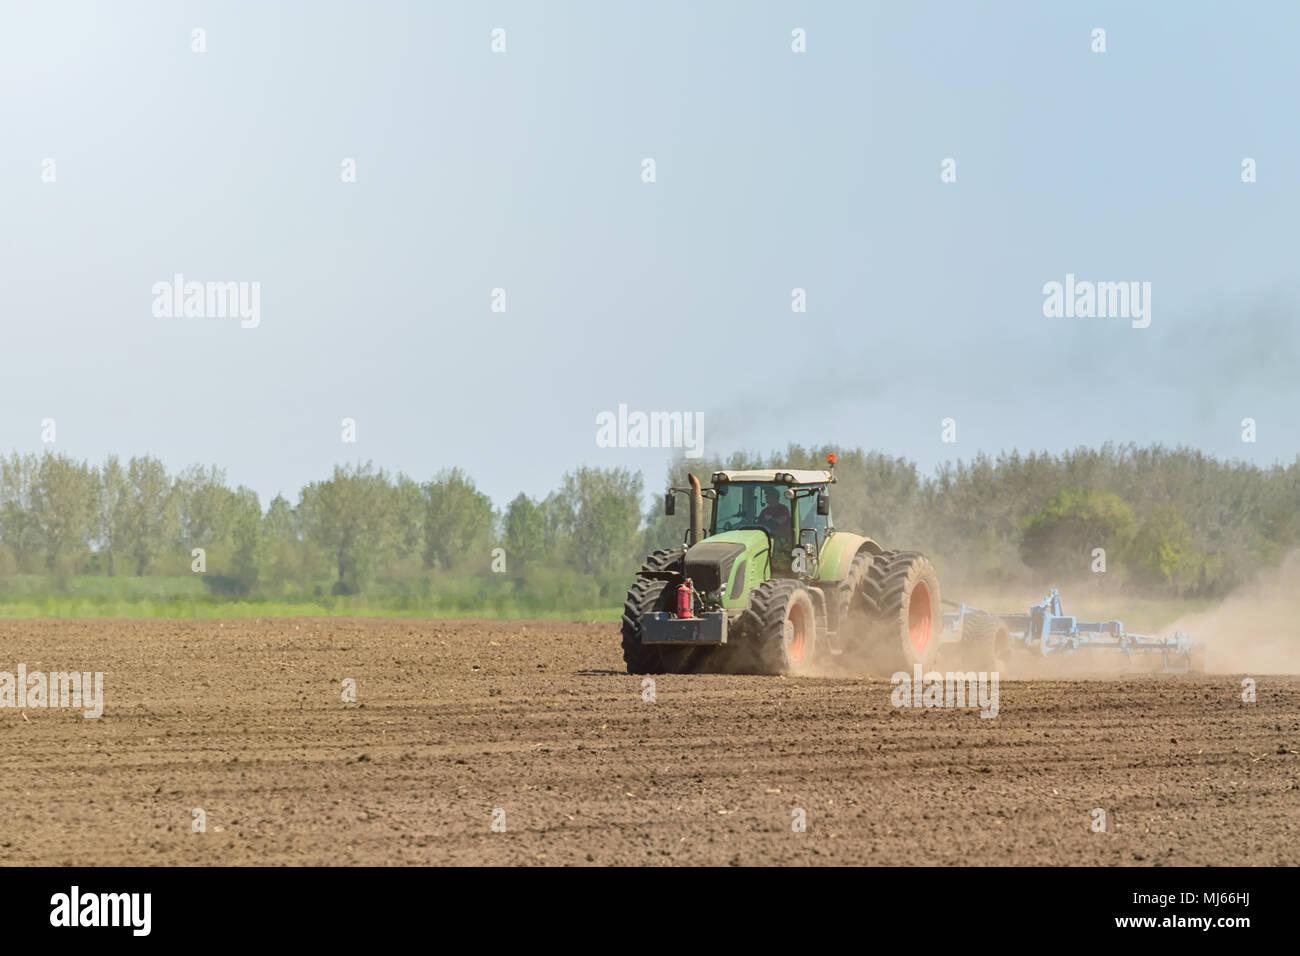 Preparing Agricultural Field Stockfotos & Preparing Agricultural ...